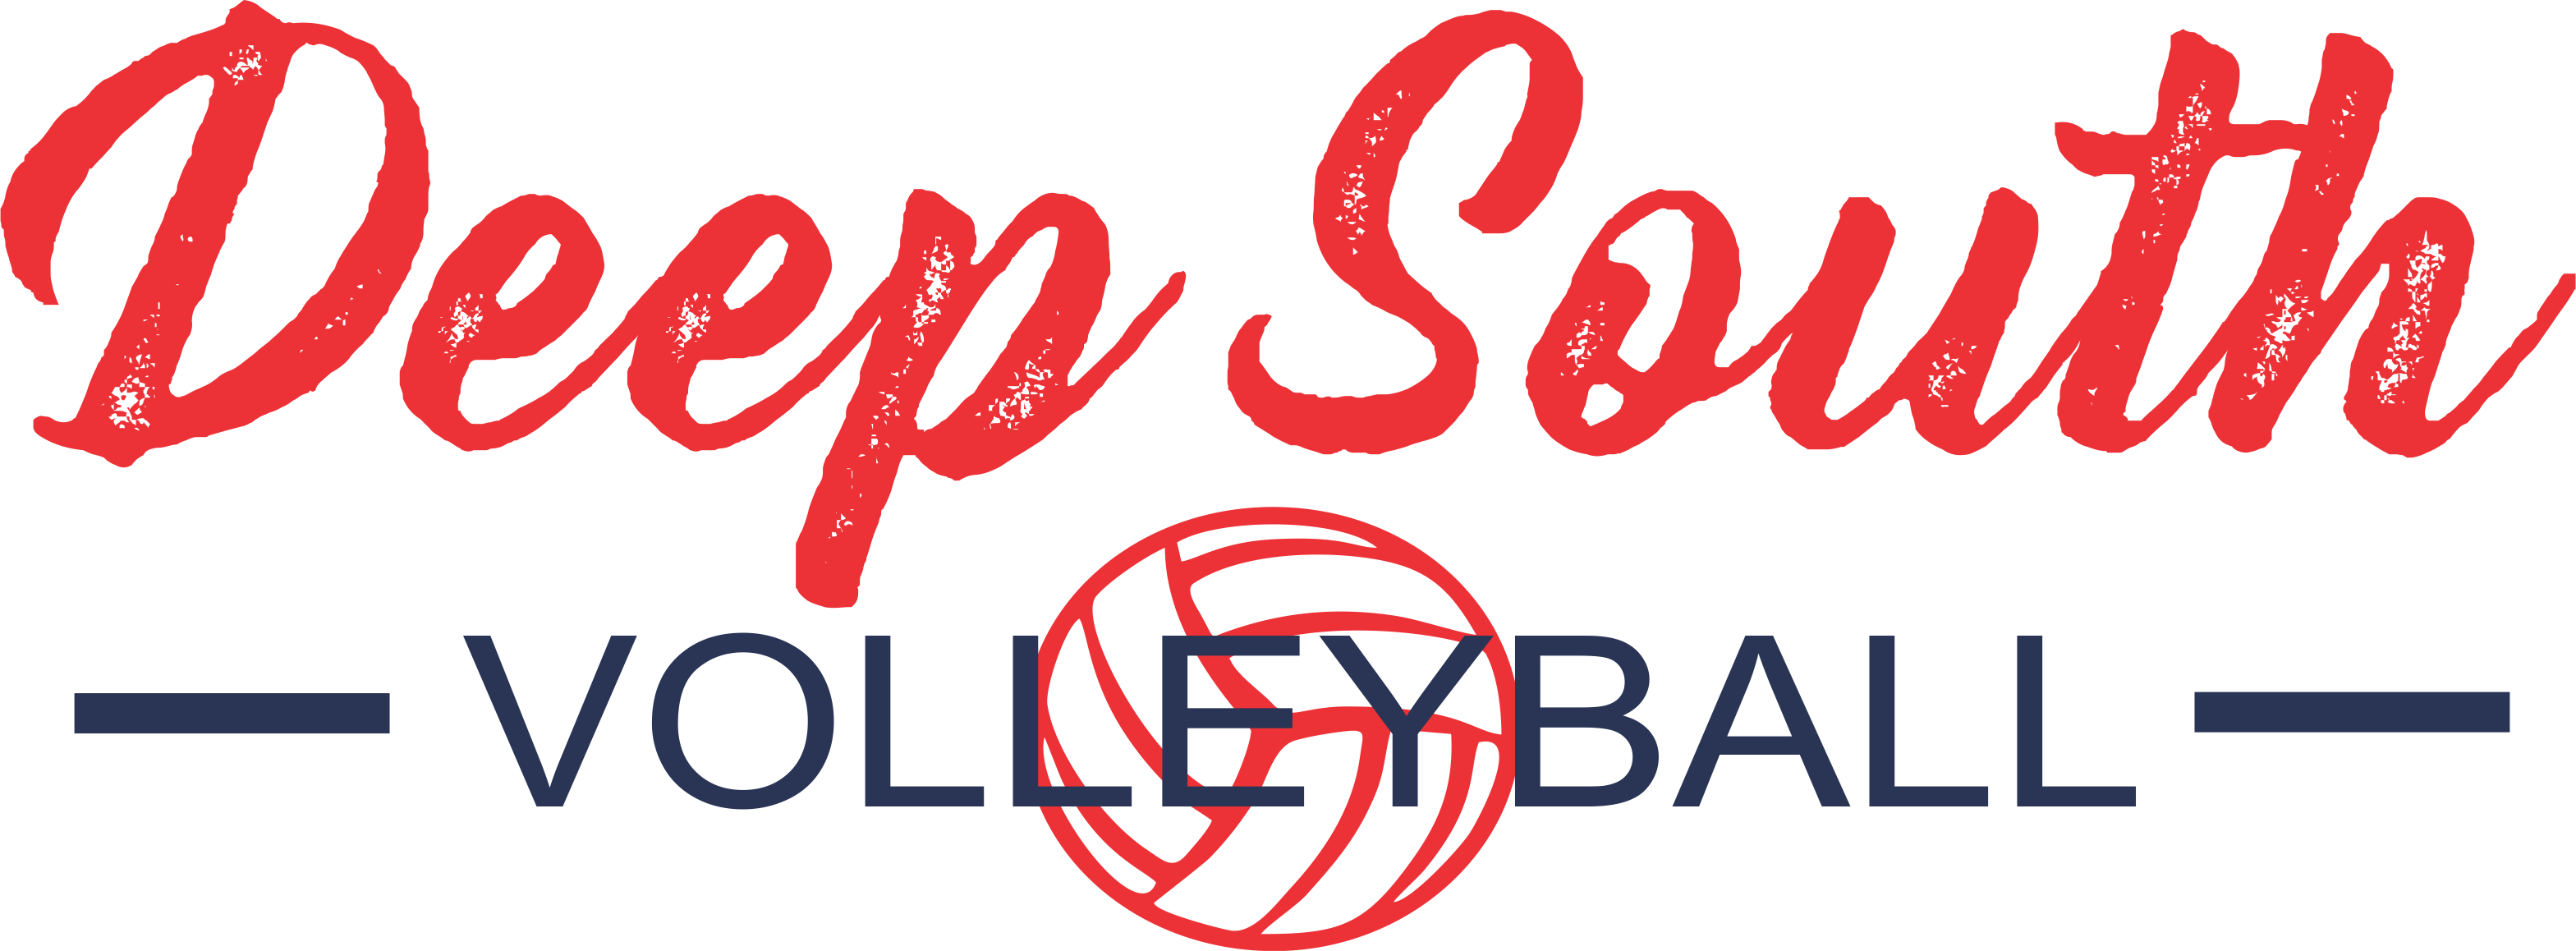 https://secureservercdn.net/198.71.233.51/c8i.092.myftpupload.com/wp-content/uploads/2020/02/Deep-South-new-logo.png